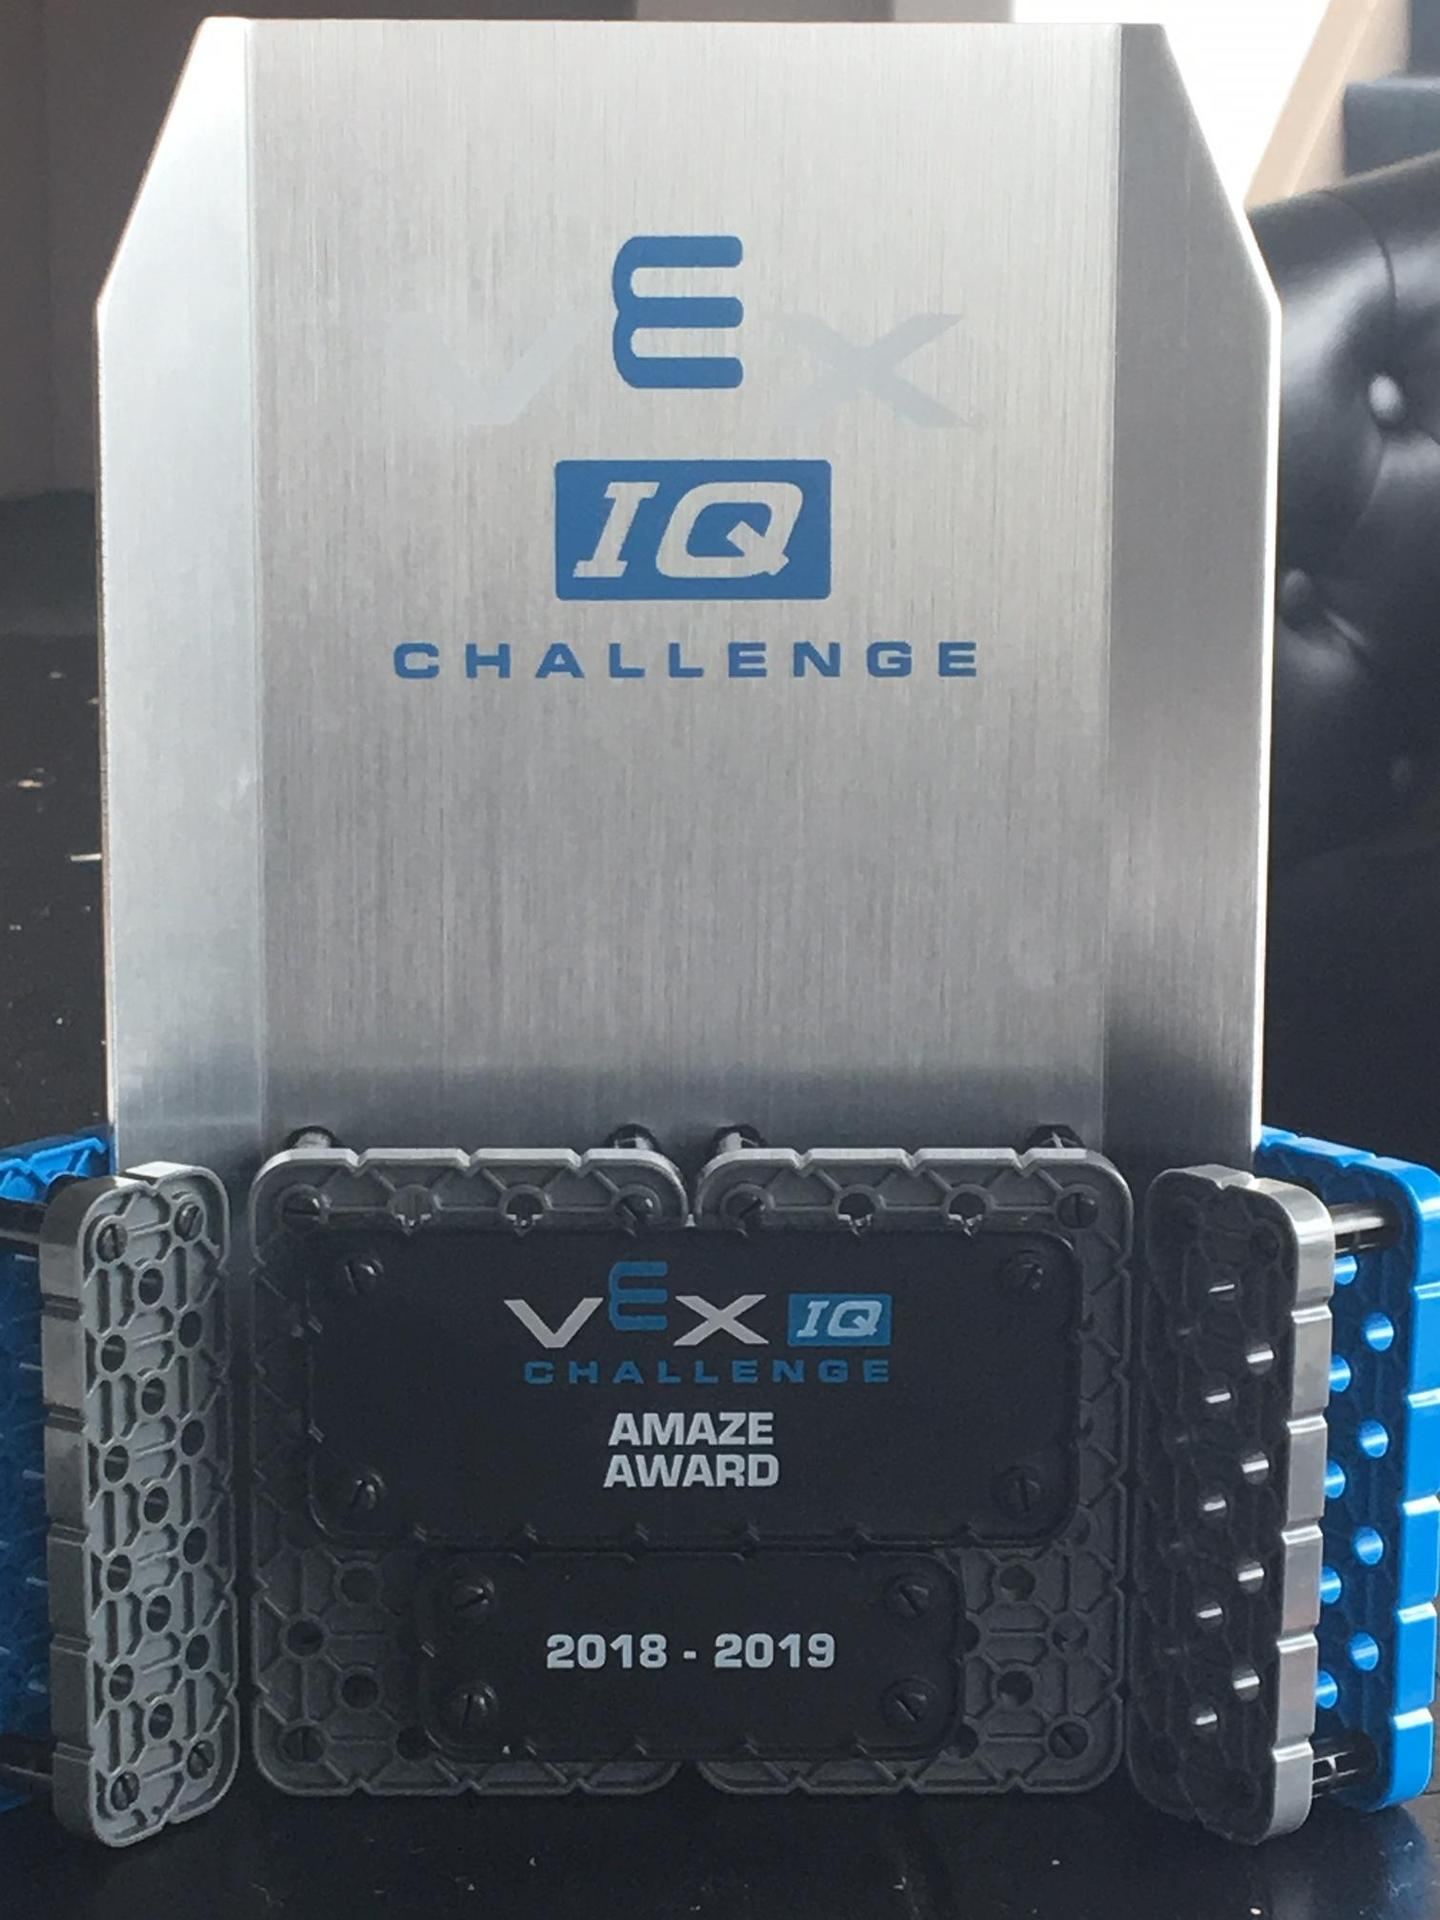 Vex IQ Challenge Robotics Competition Award